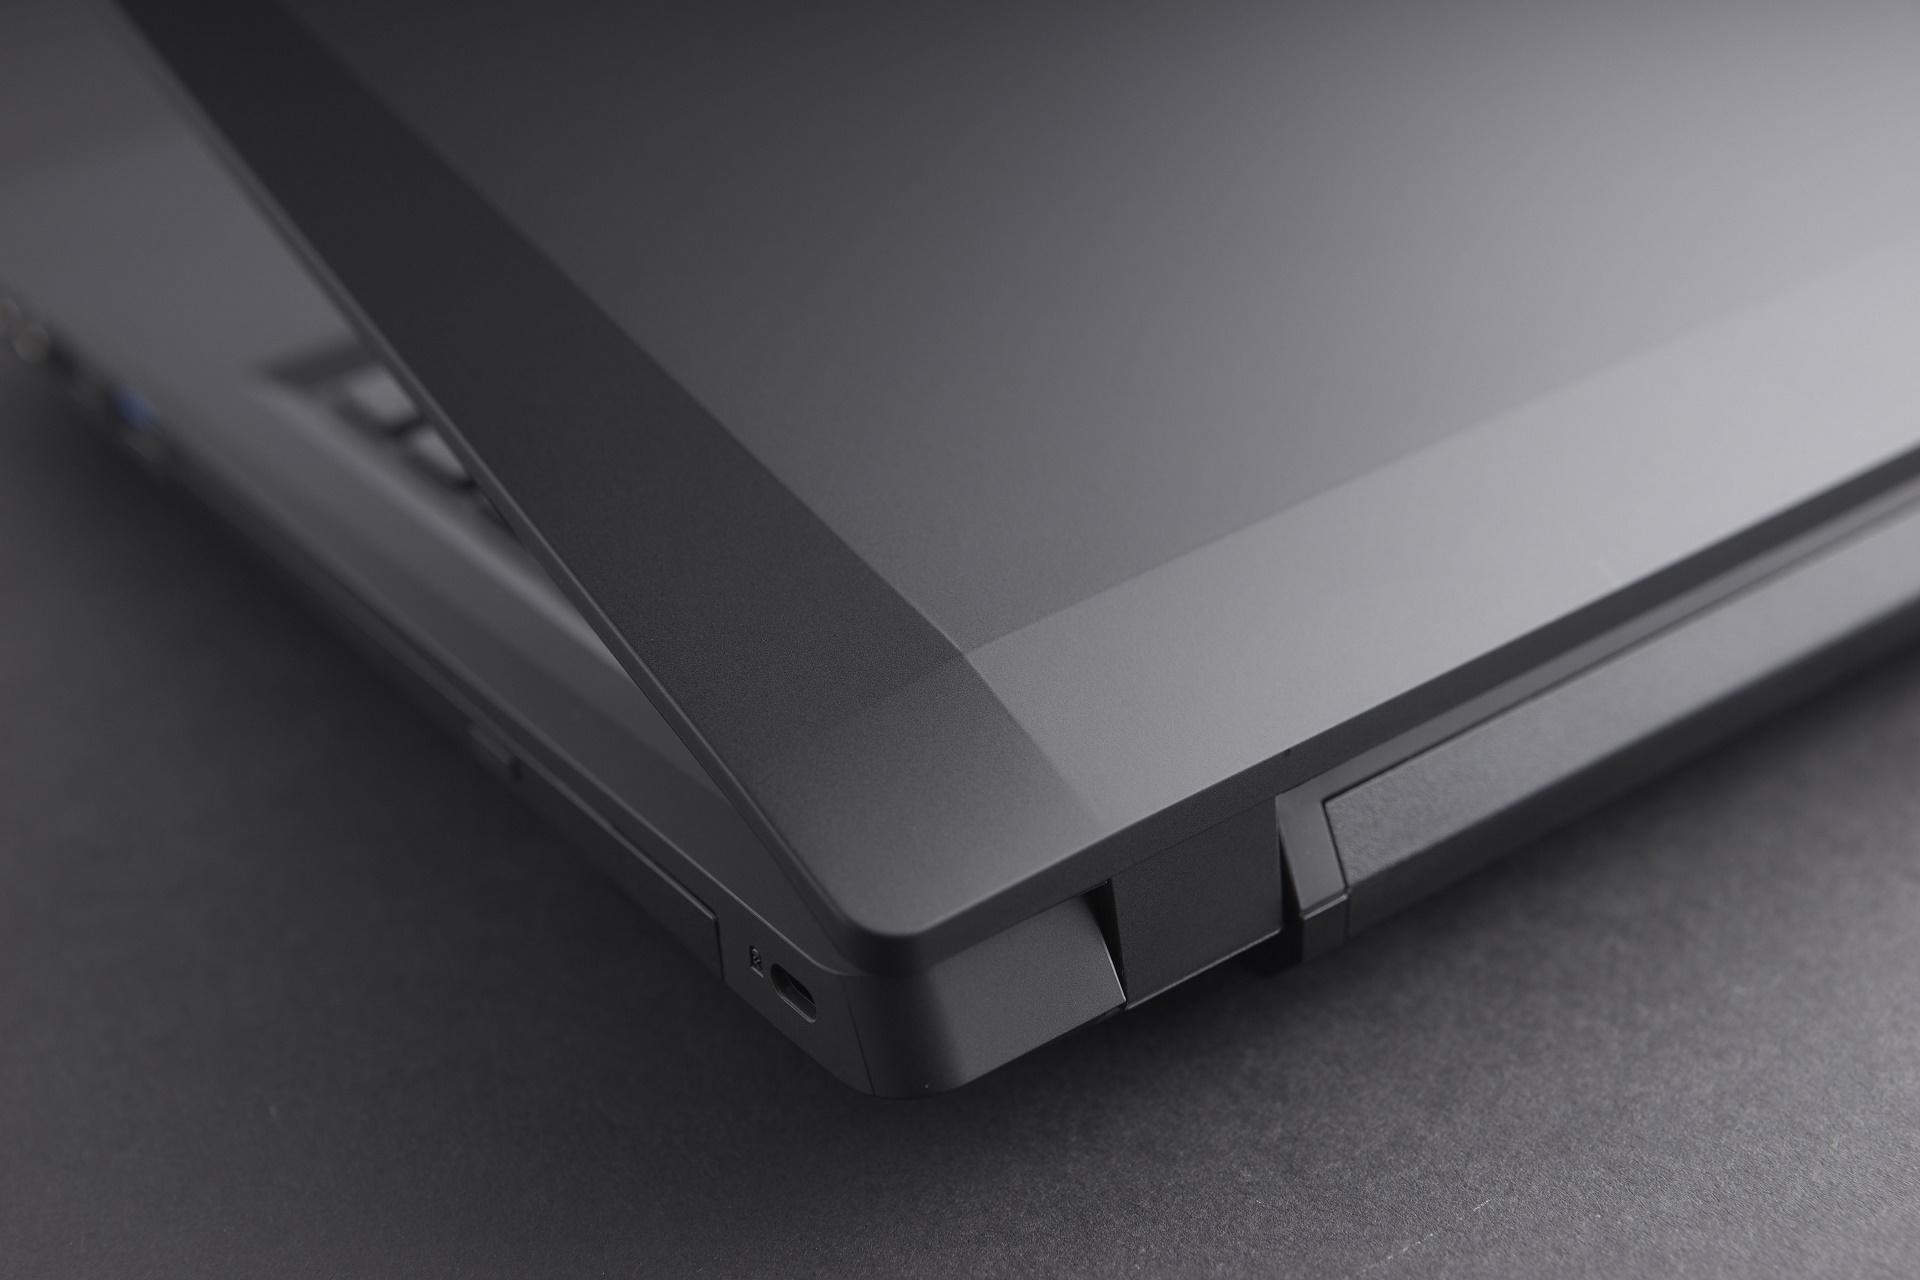 2. Quality matte black finish blends an extra bit of sleekness into its angular diamond lines